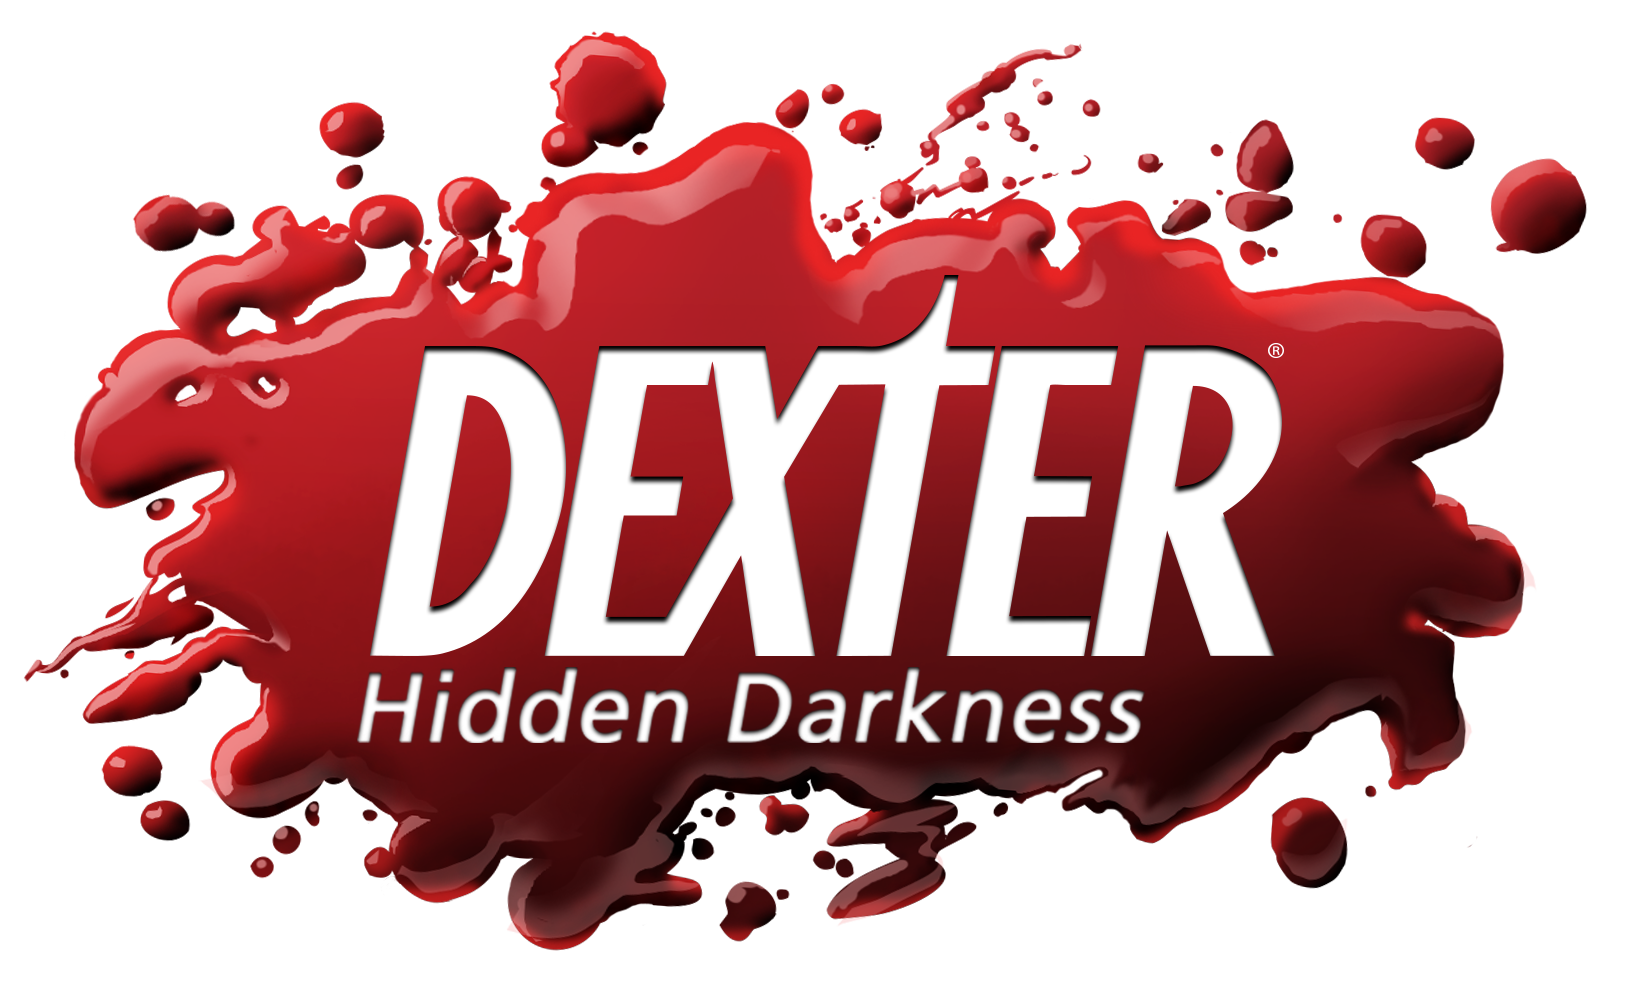 Dexter Hidden Darkness